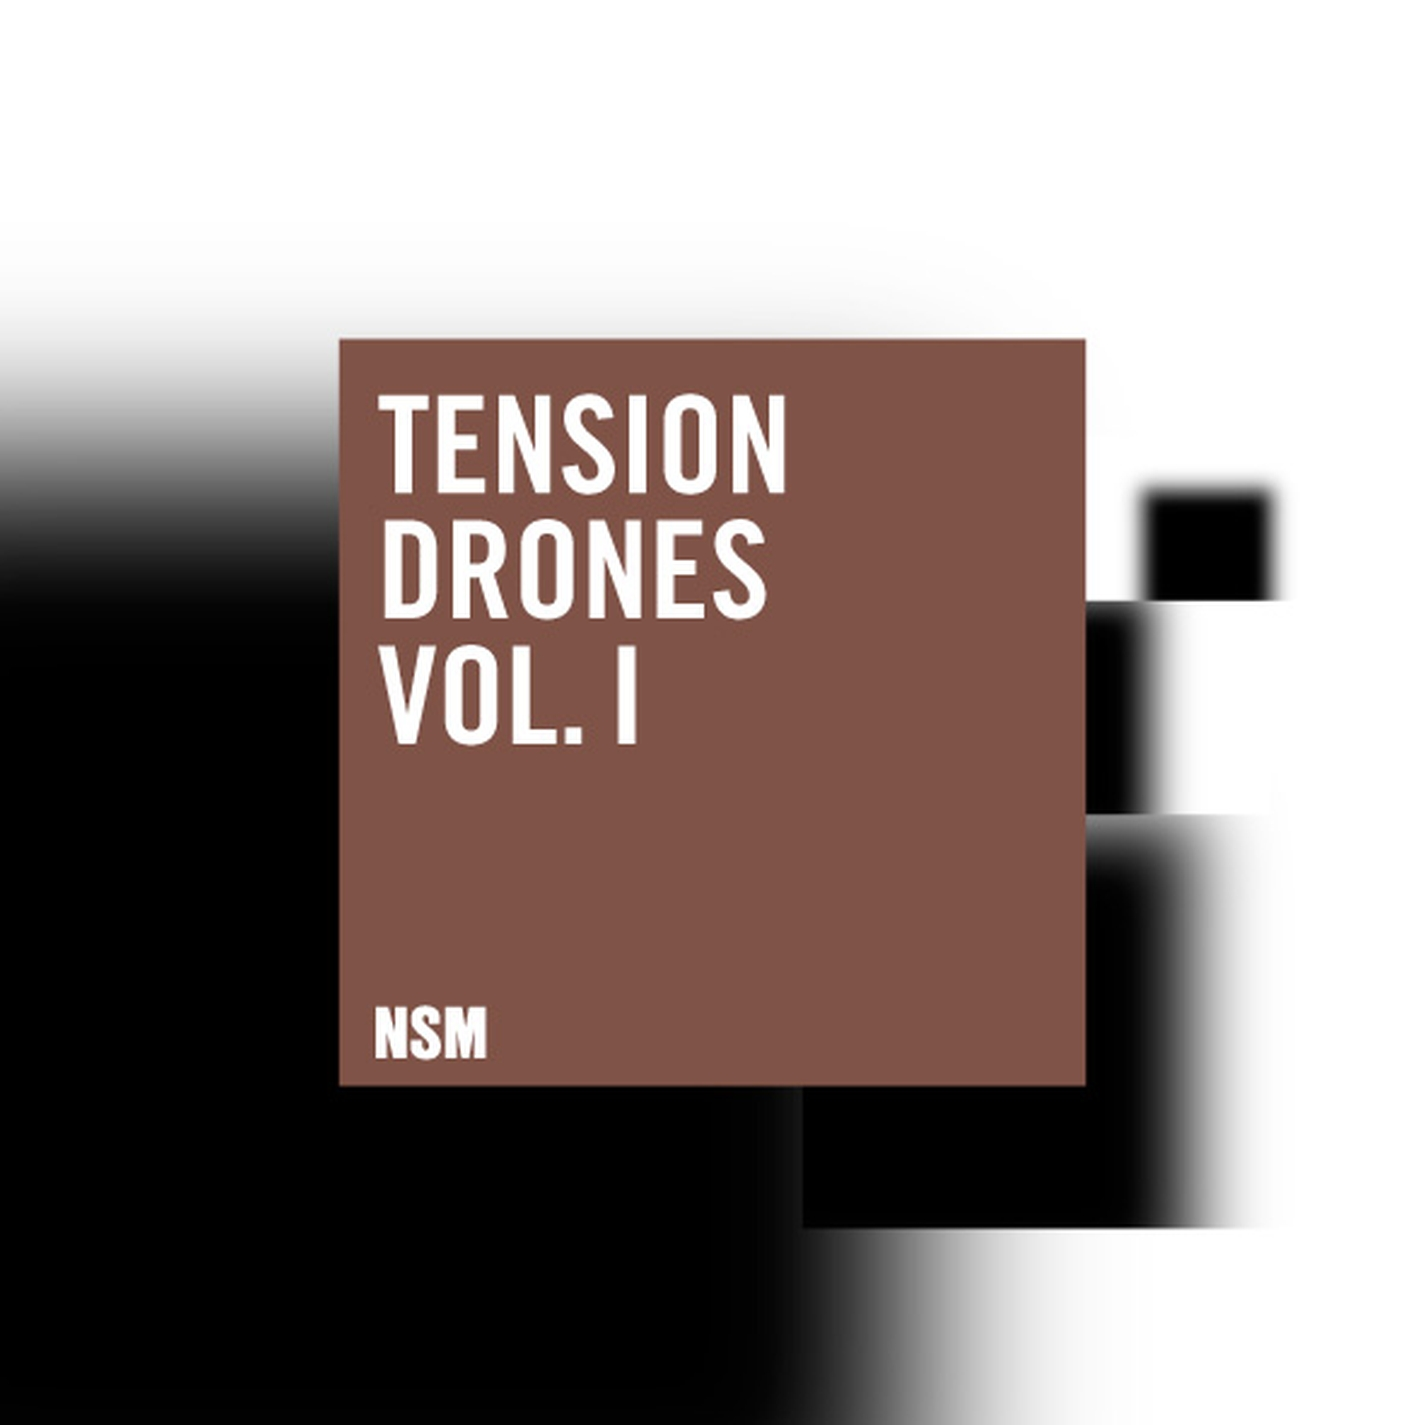 Tension Drones Vol. I